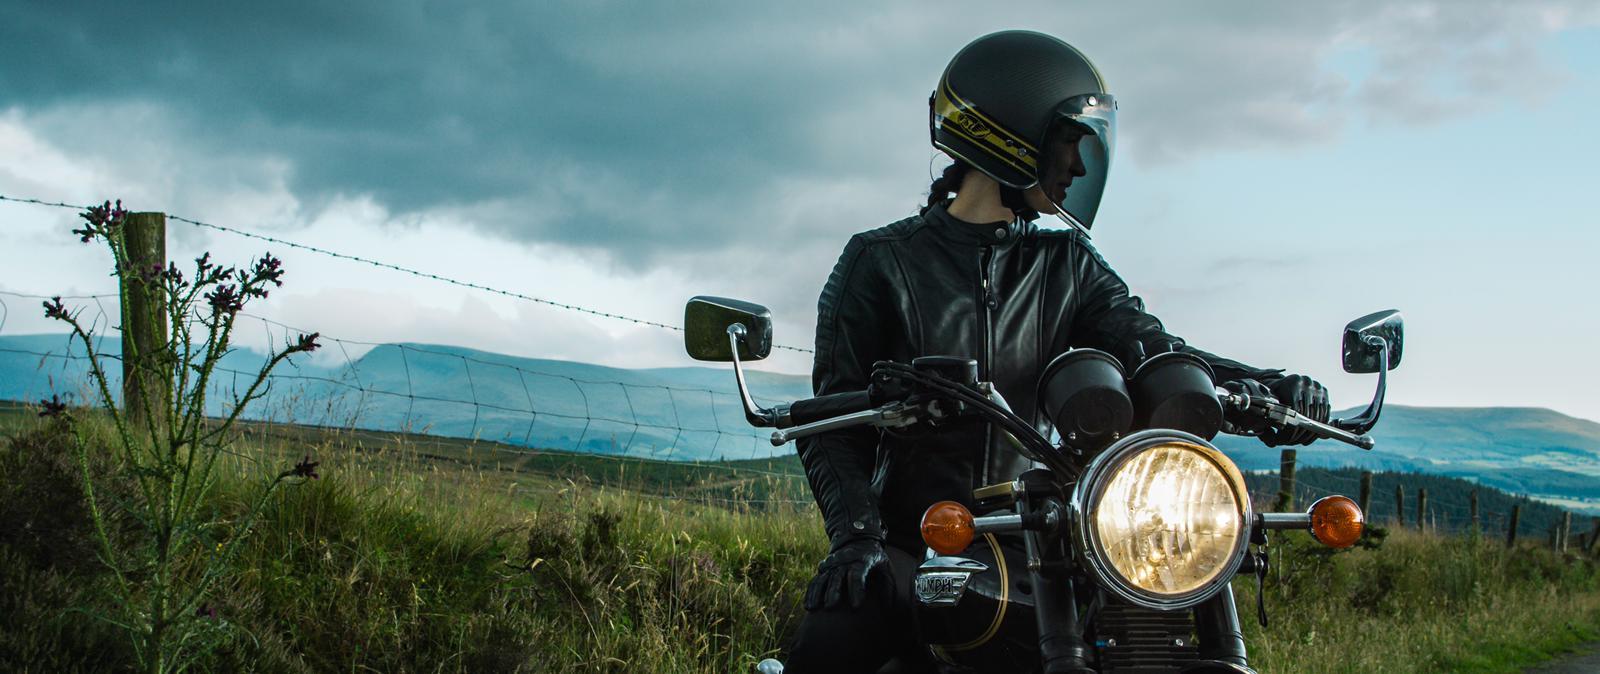 Kojii Helnwein Triumph Bonneville by Federico Rea.jpeg